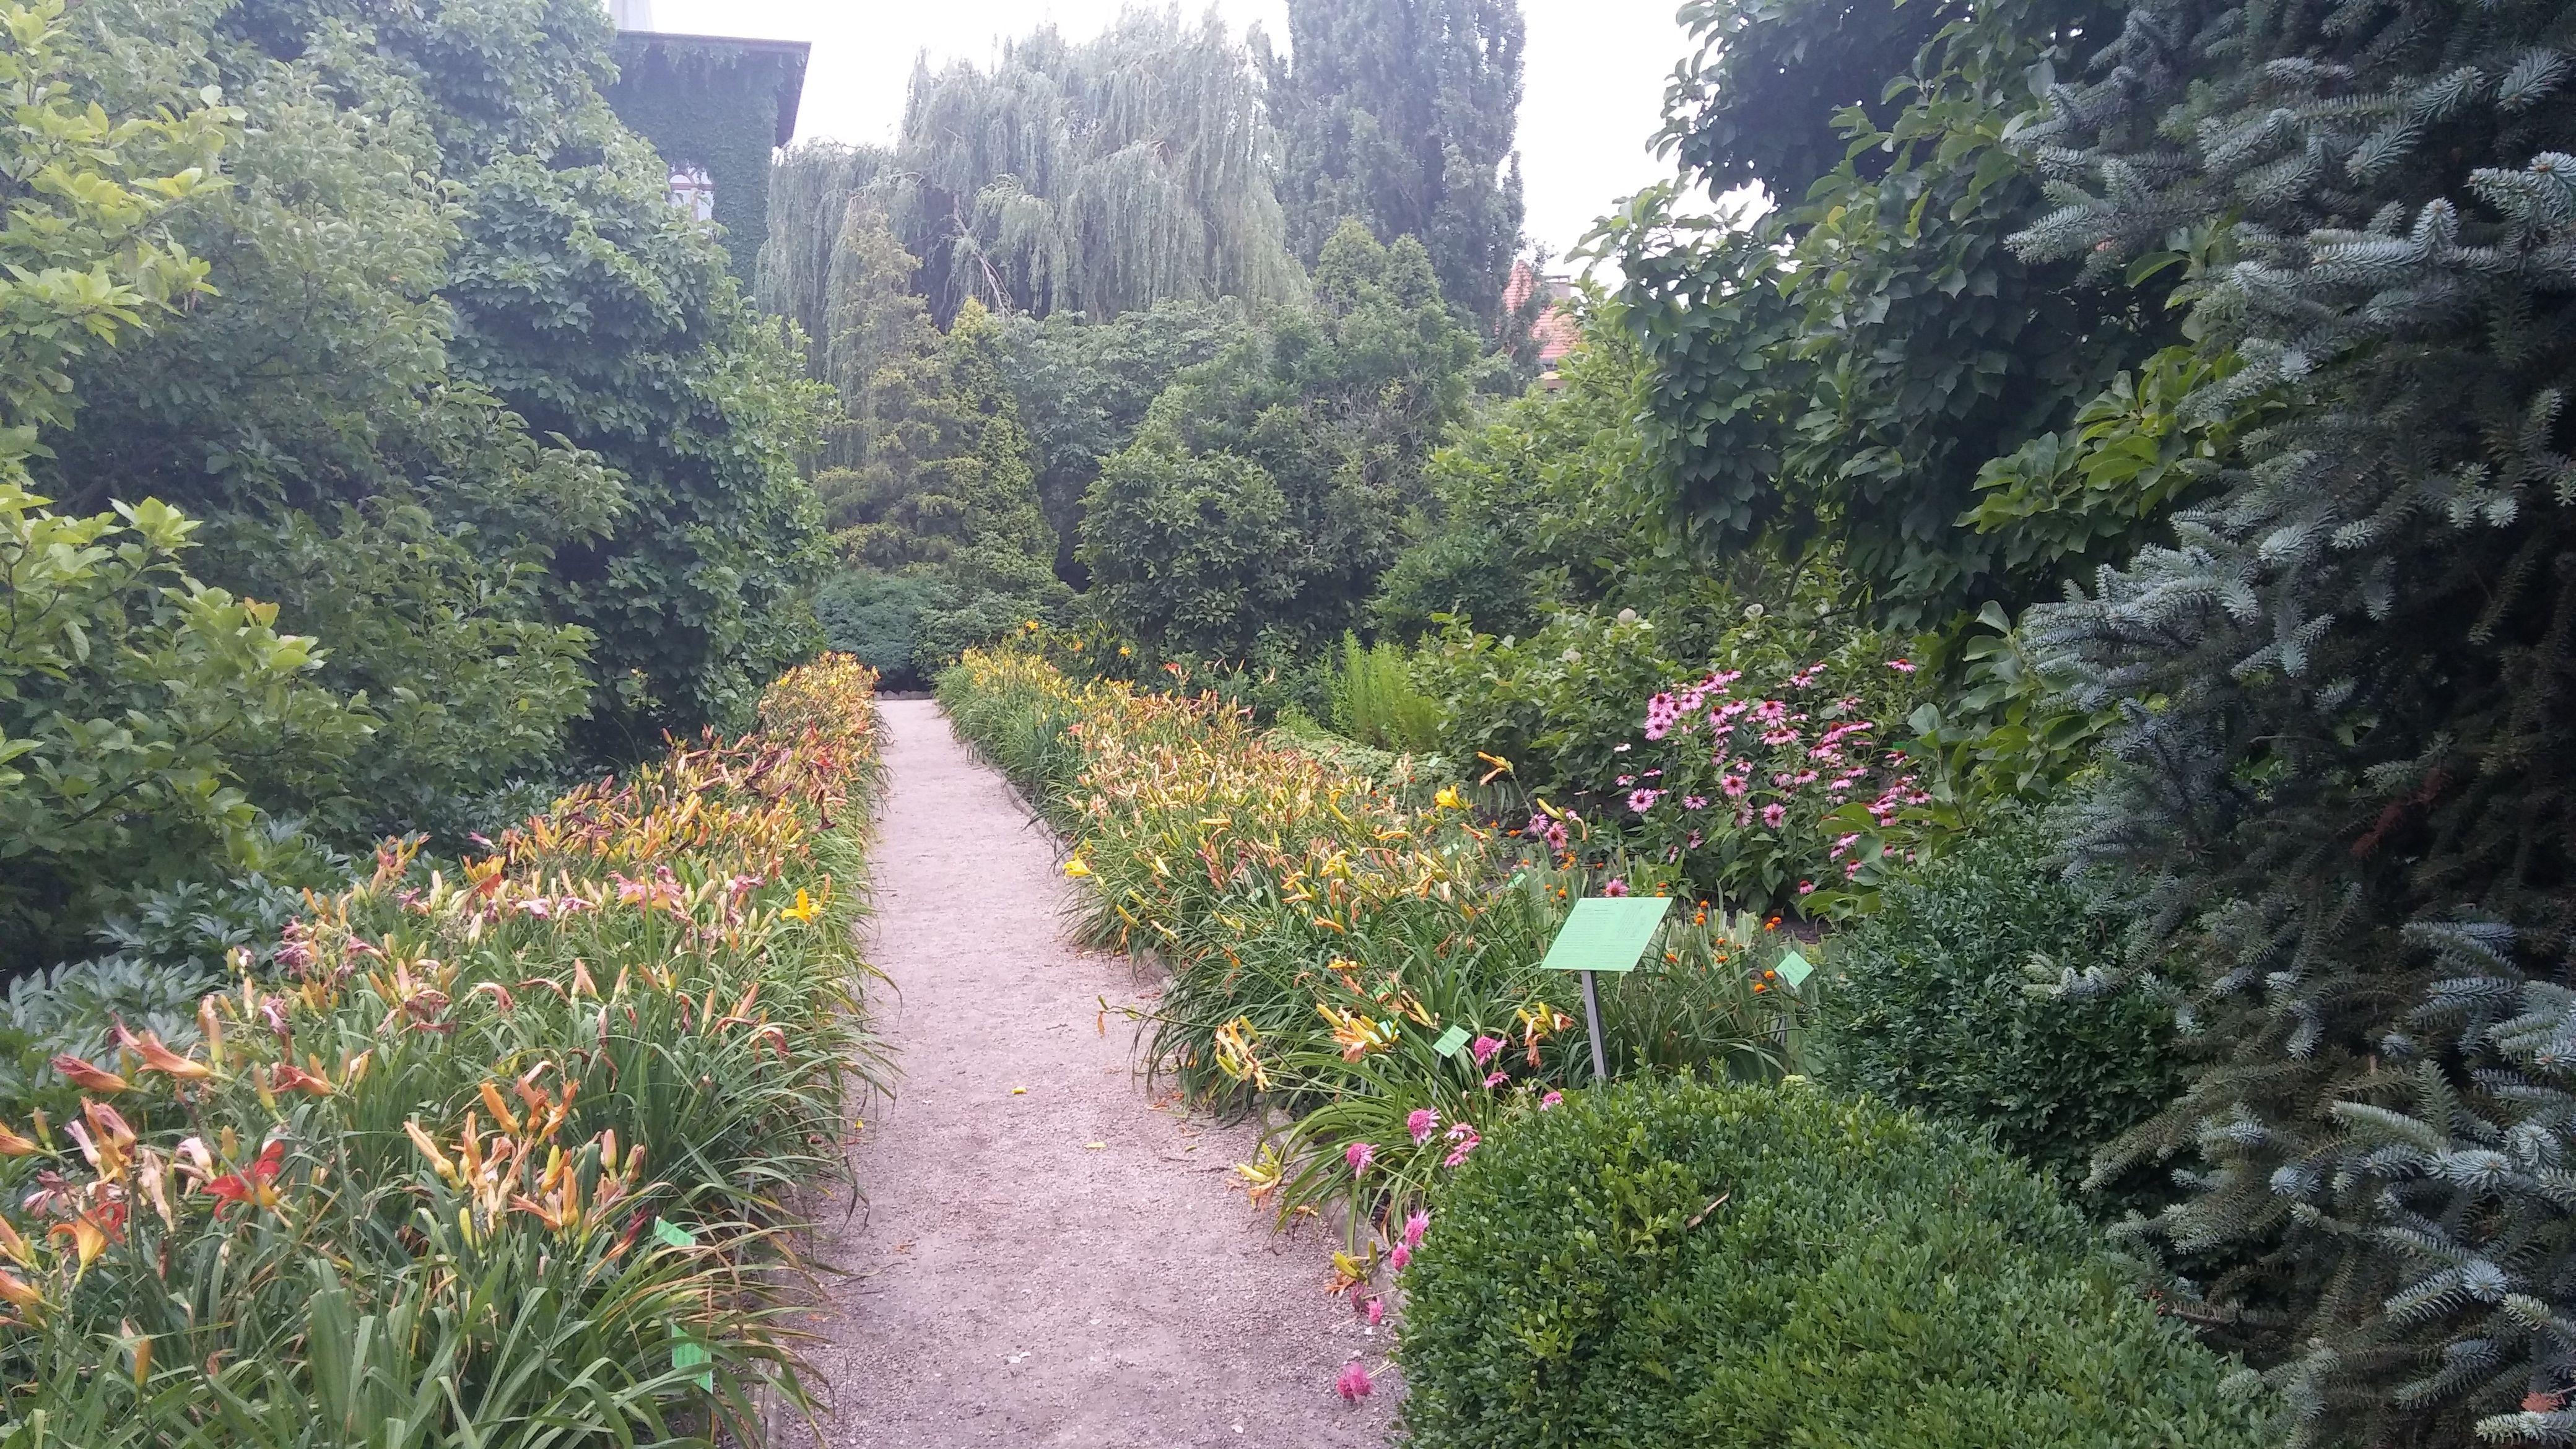 Gruntowe Rosliny Ozdobne Ornamental Plants Ogrod Botaniczny Uniwersytetu Wroclawskiego The Botanical Garden Of Botanical Gardens Landscape Travel Photos